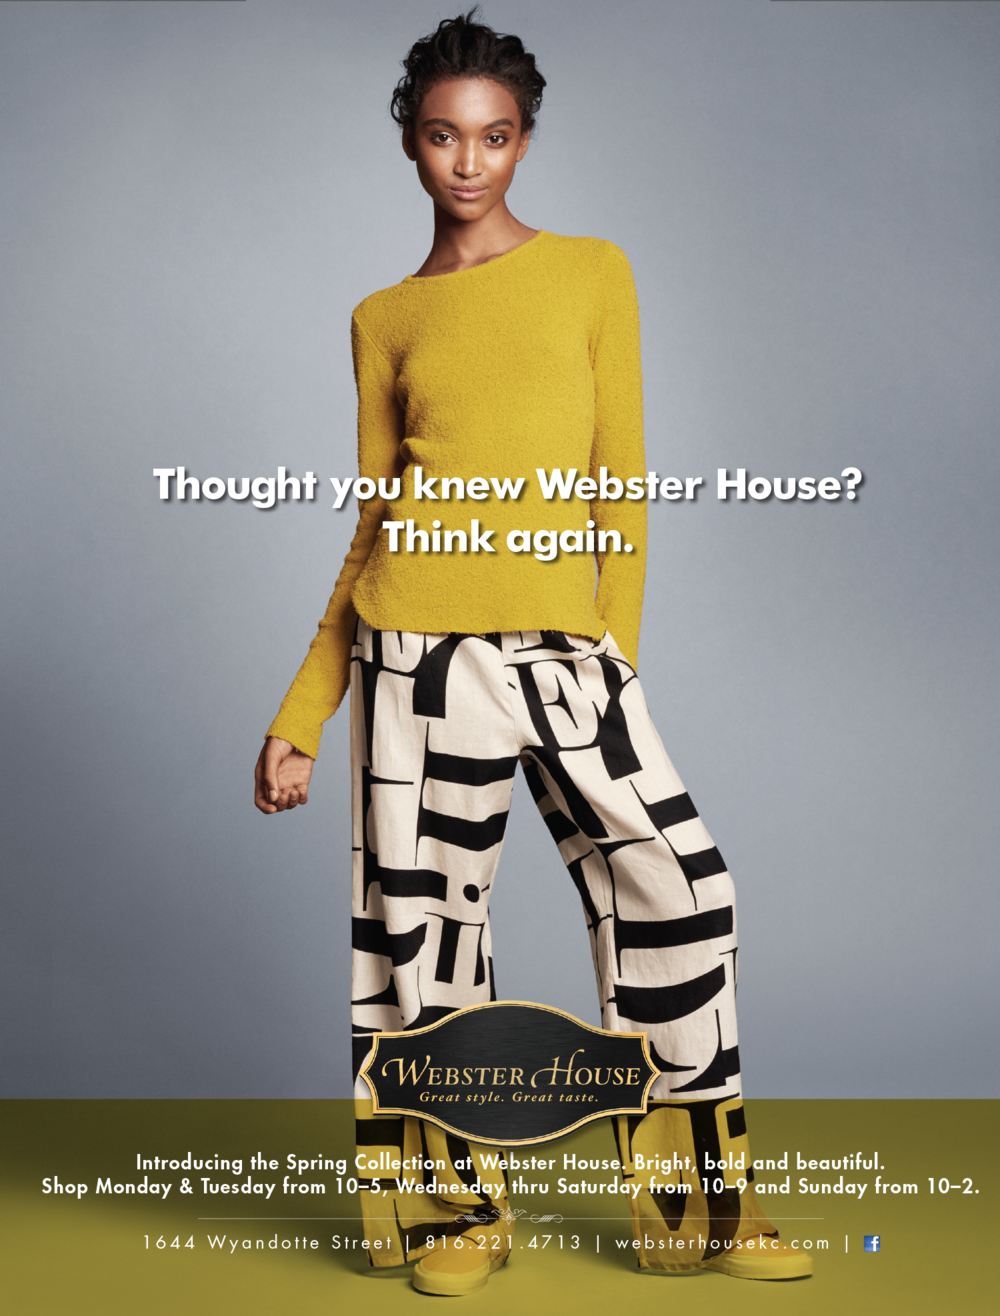 websterhouse_ad.jpg